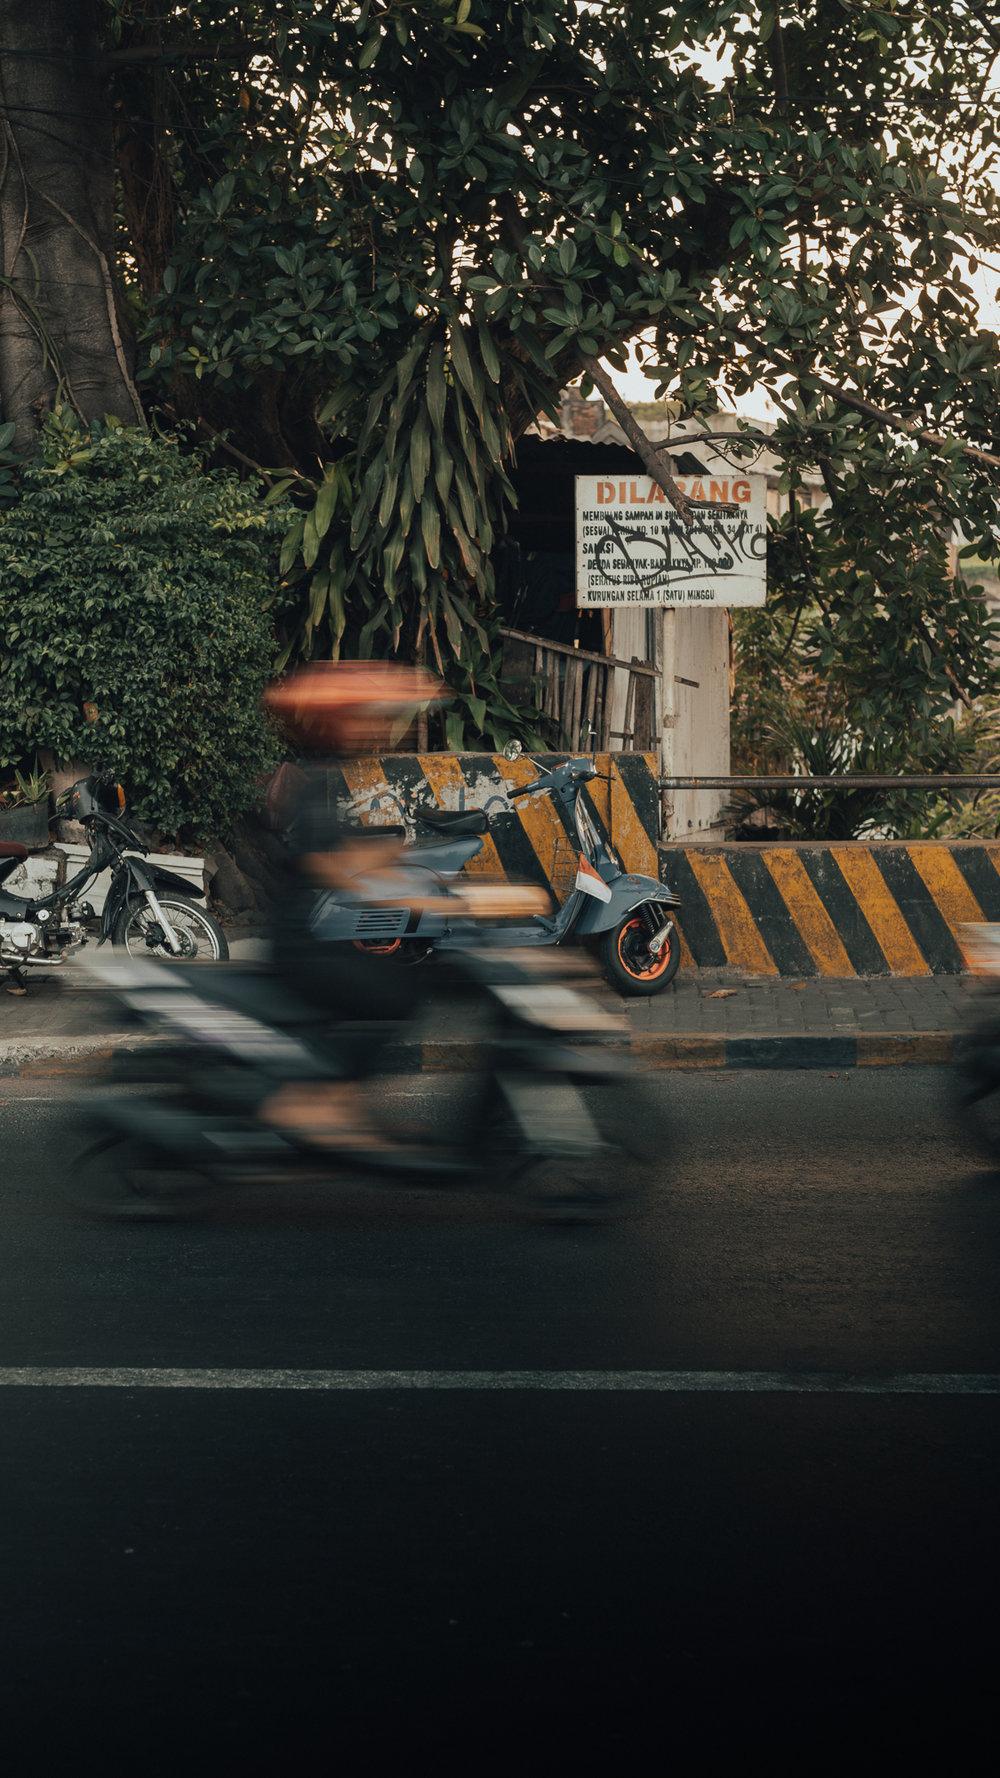 indonesia-59.jpg